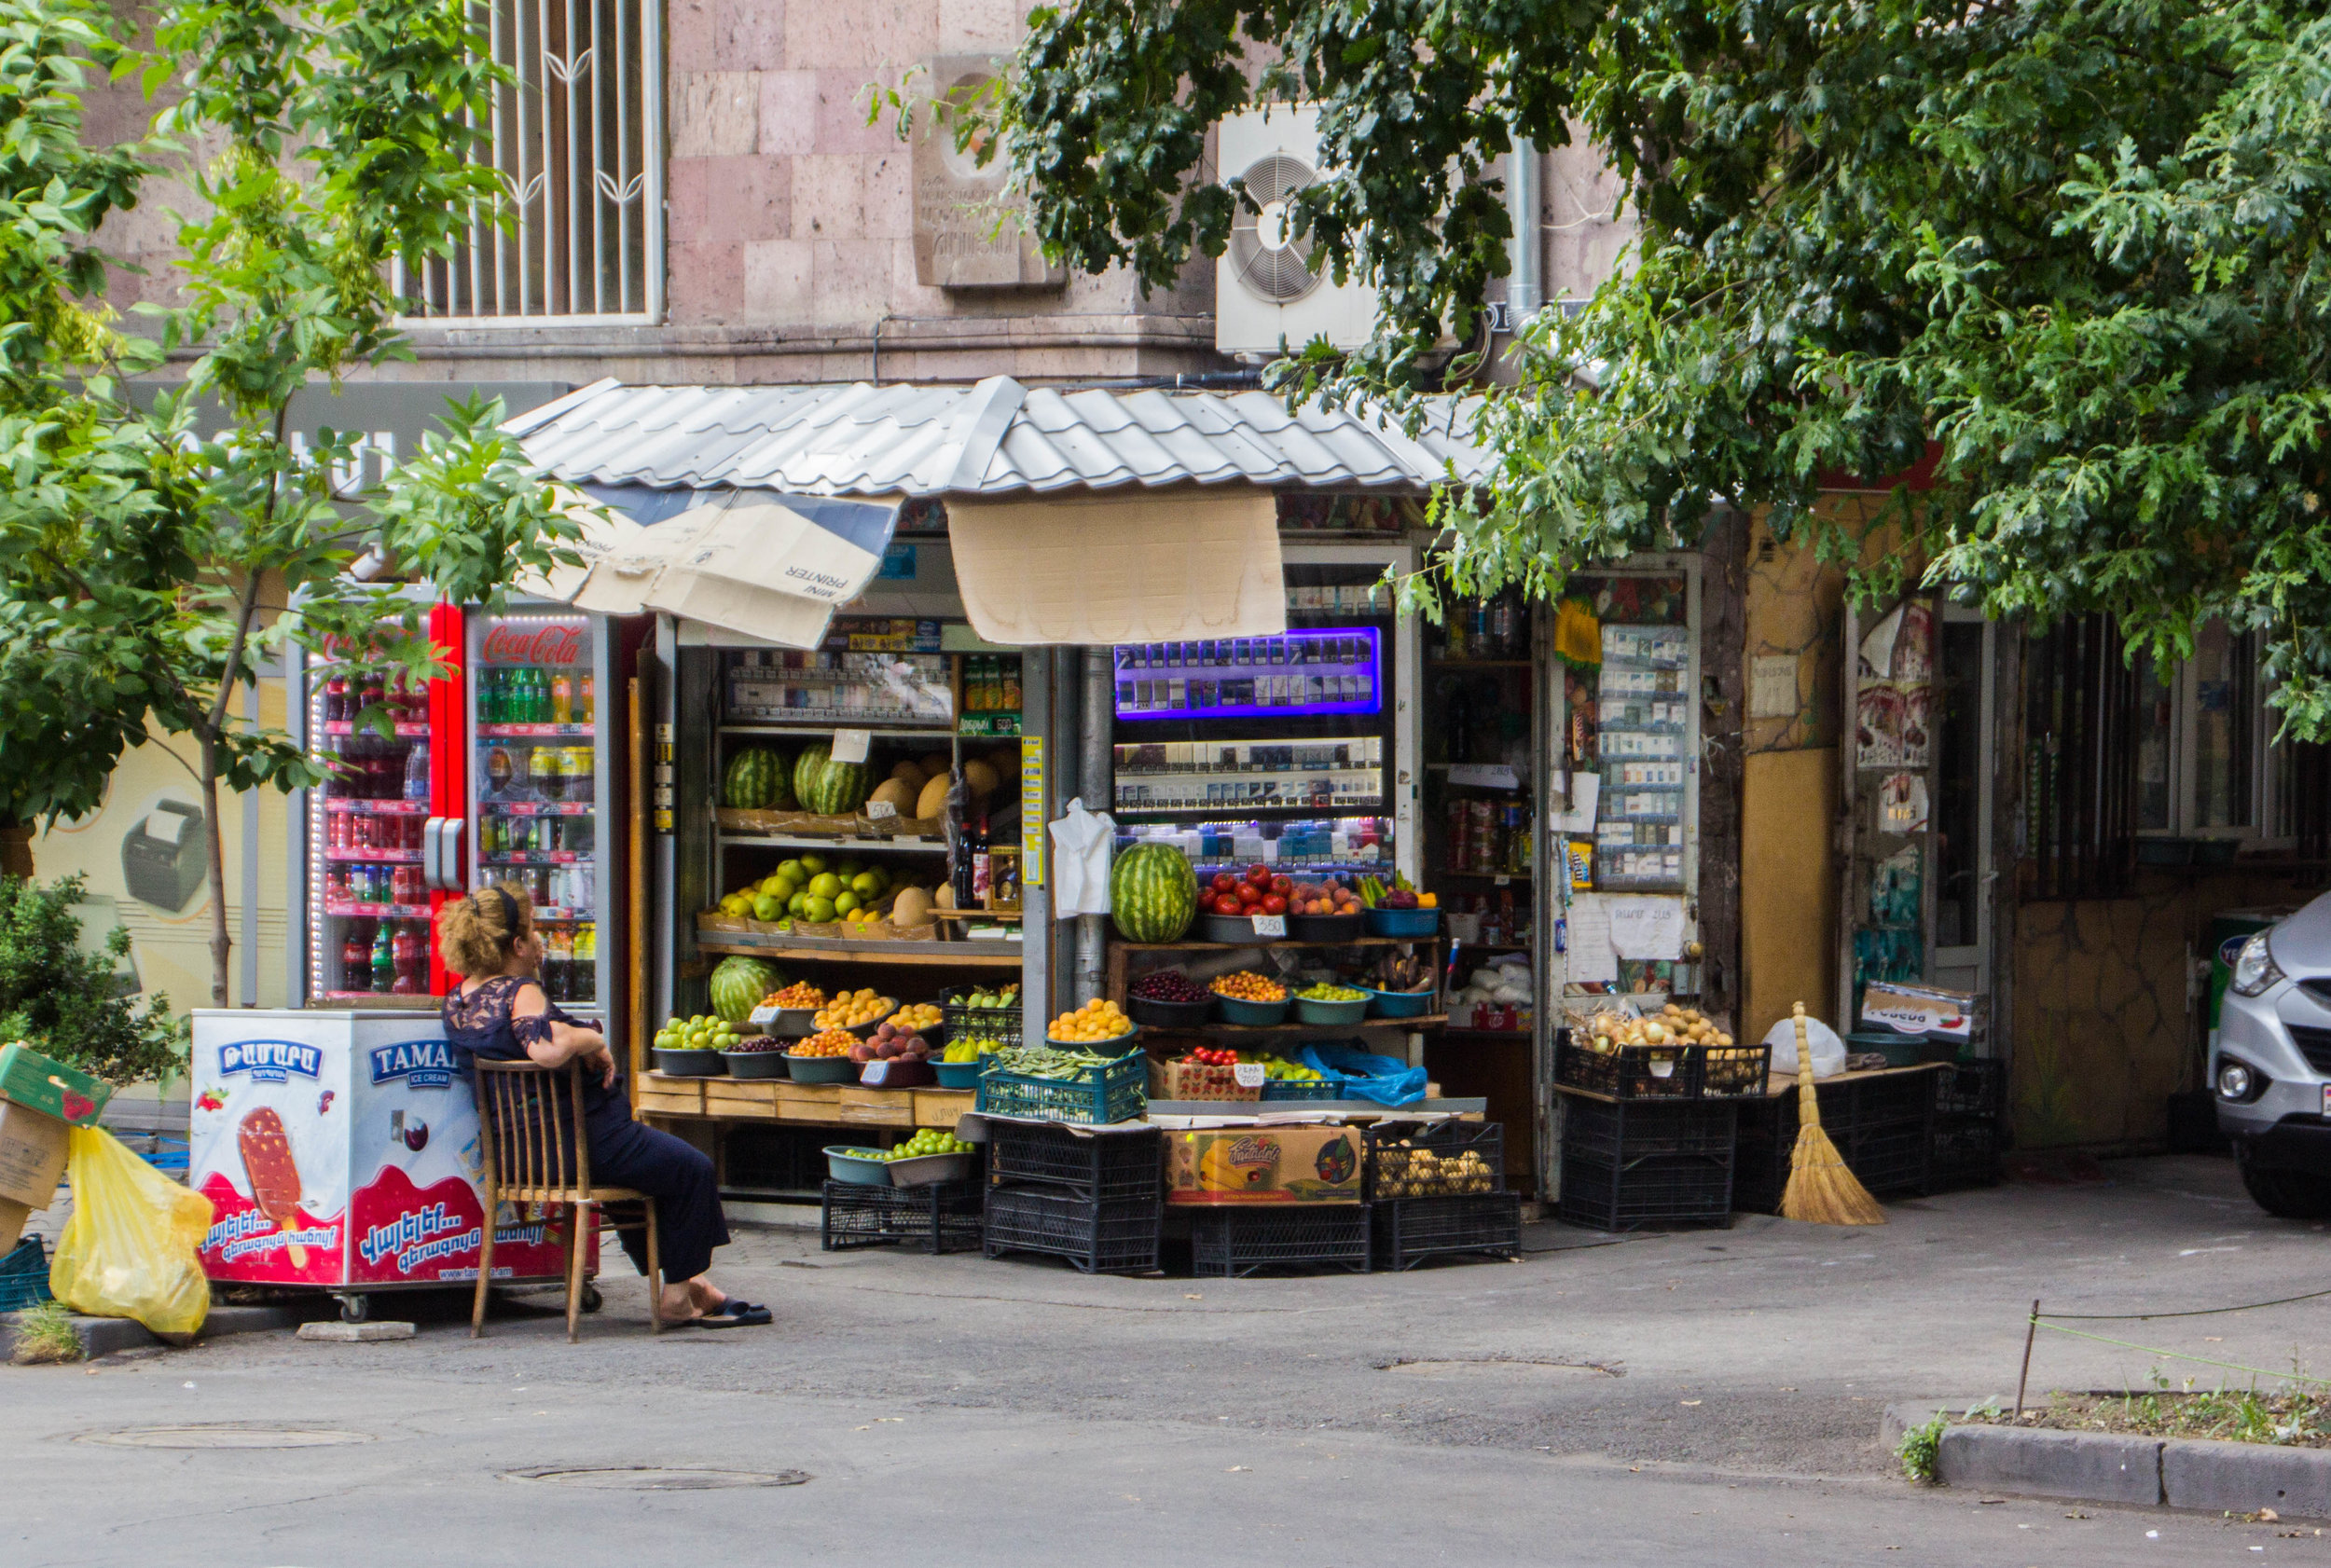 yerevan-armenia-streets-1-3.jpg